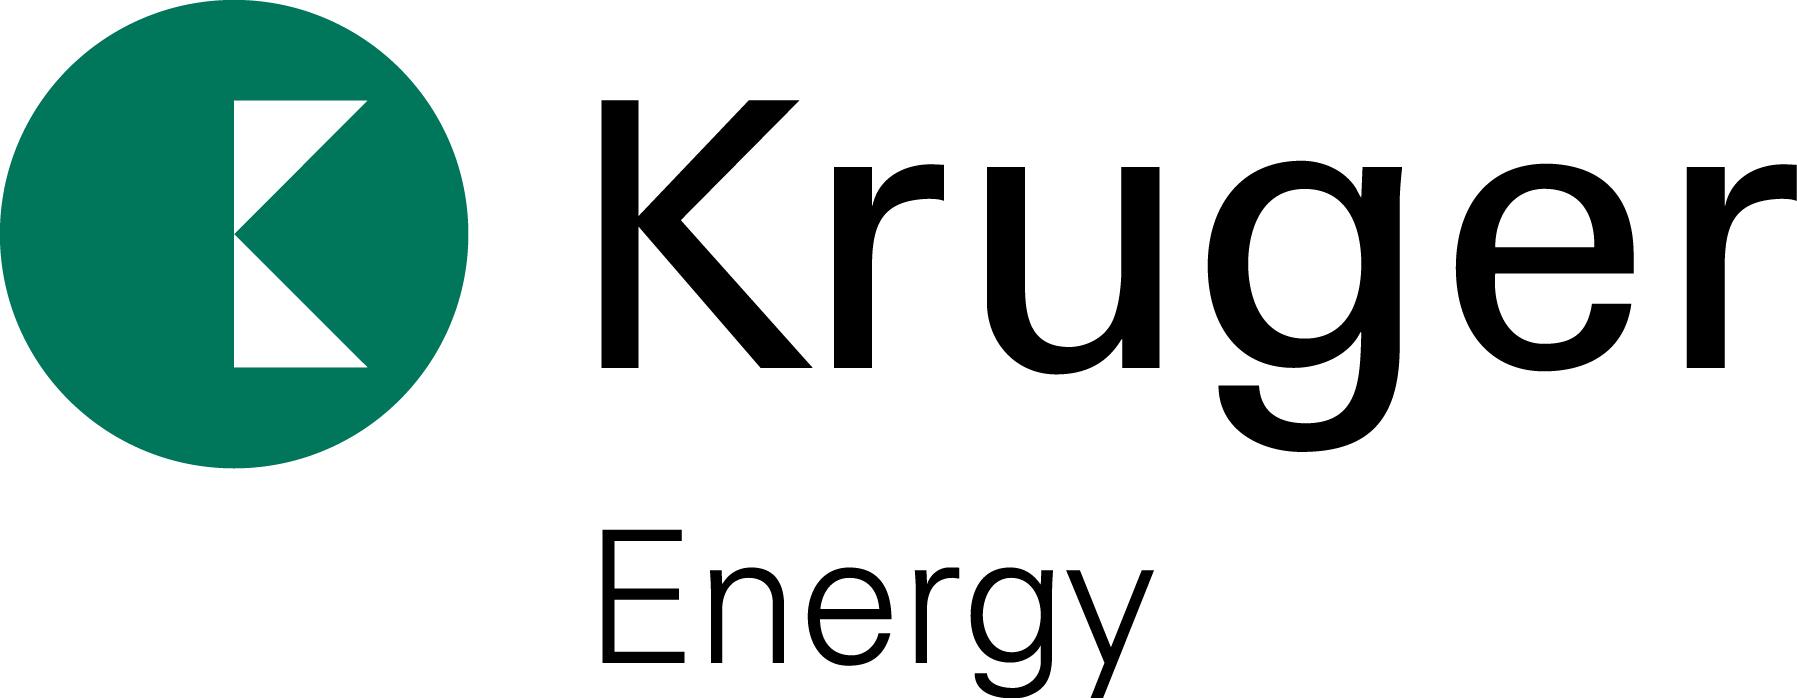 Kruger-energy-coul-flat.jpg